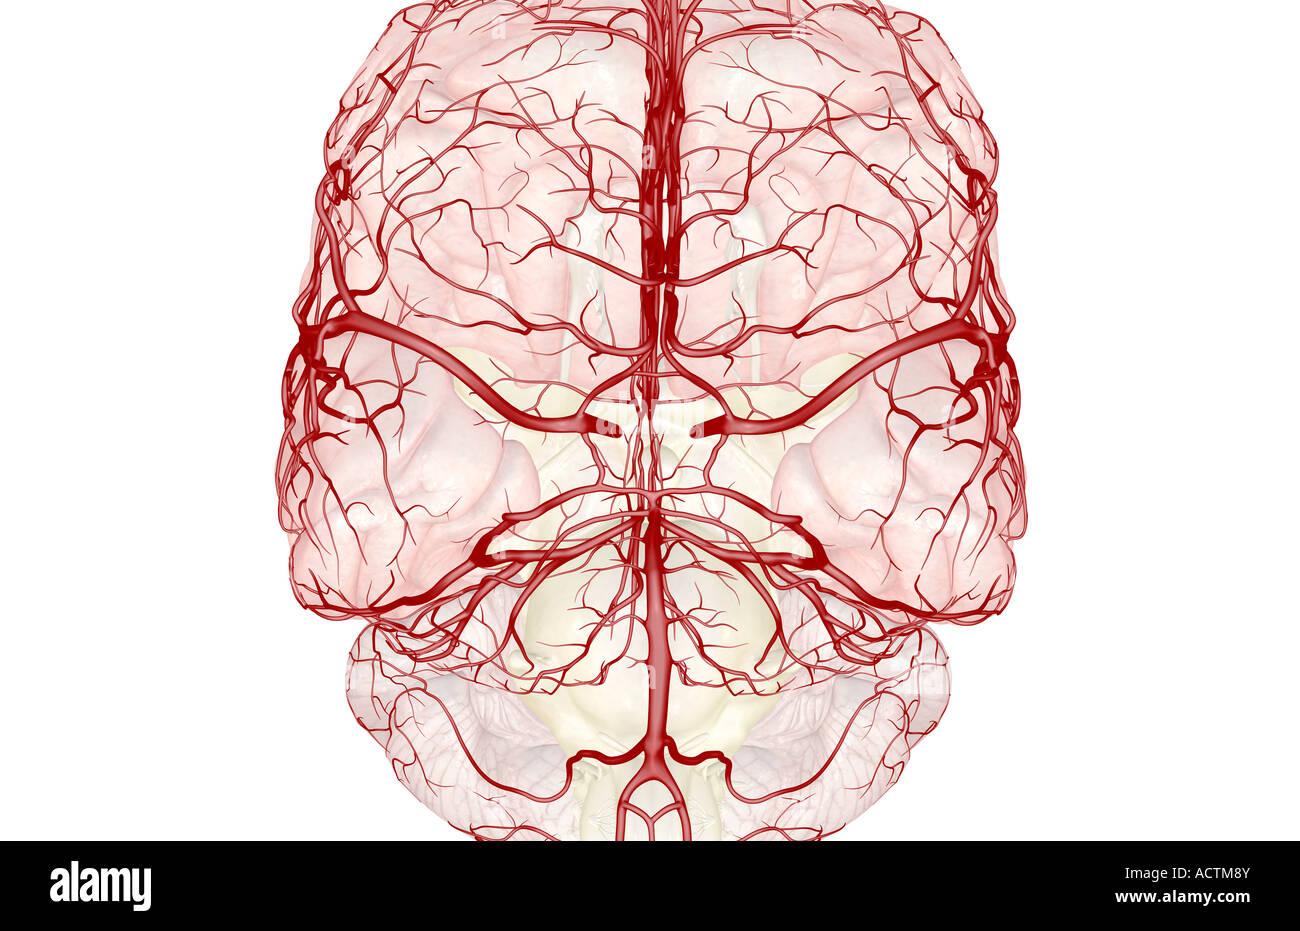 Circulus arteriosus cerebri Stockfoto, Bild: 13228202 - Alamy